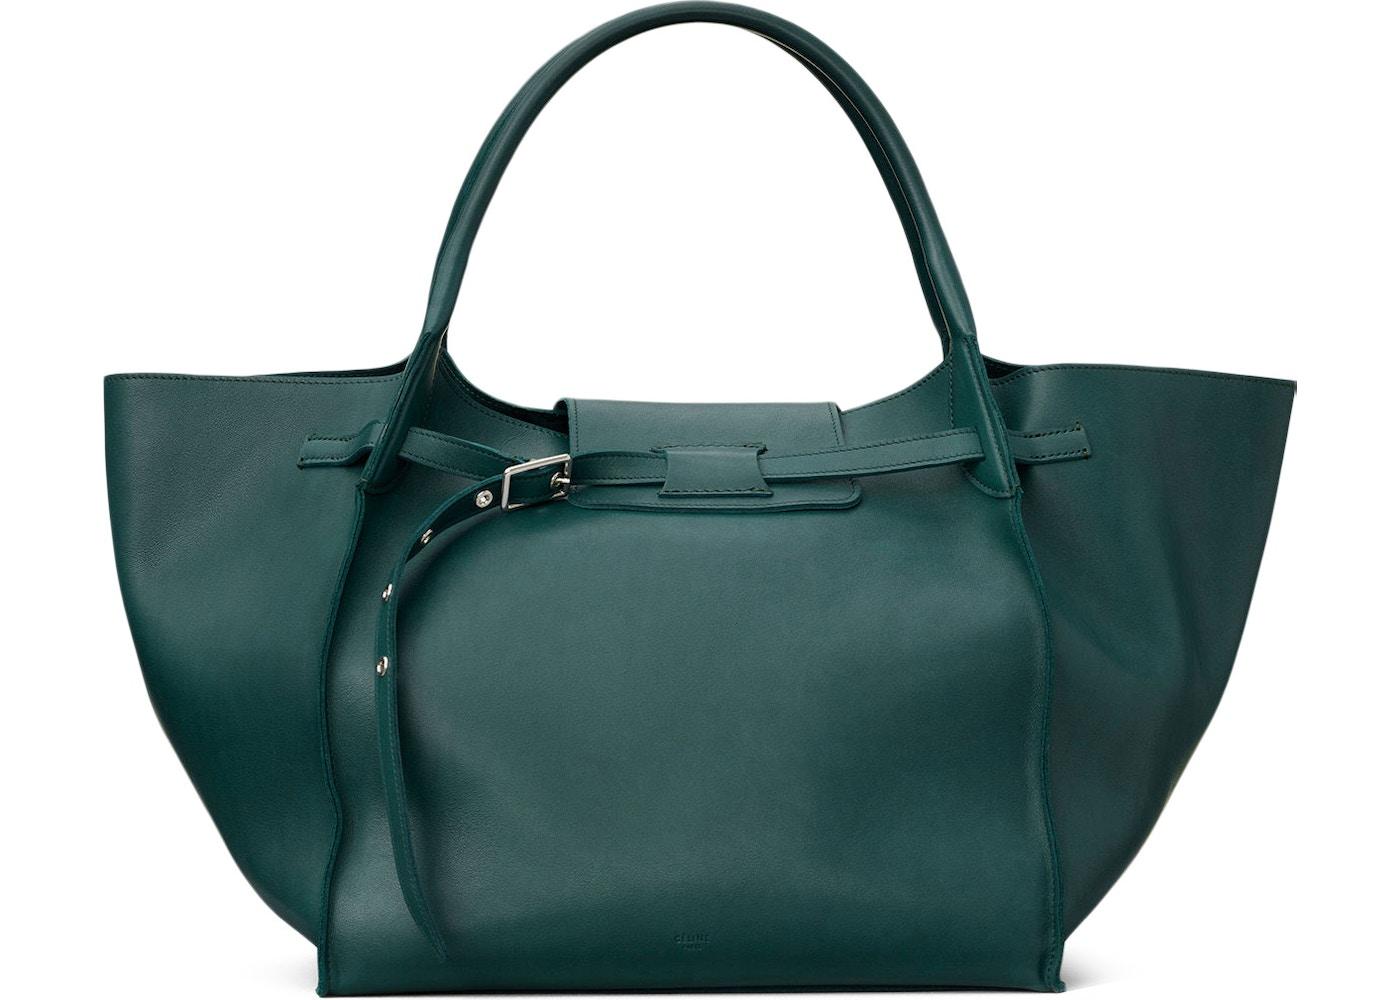 92500f802a Buy   Sell Celine Handbags - Highest Bid